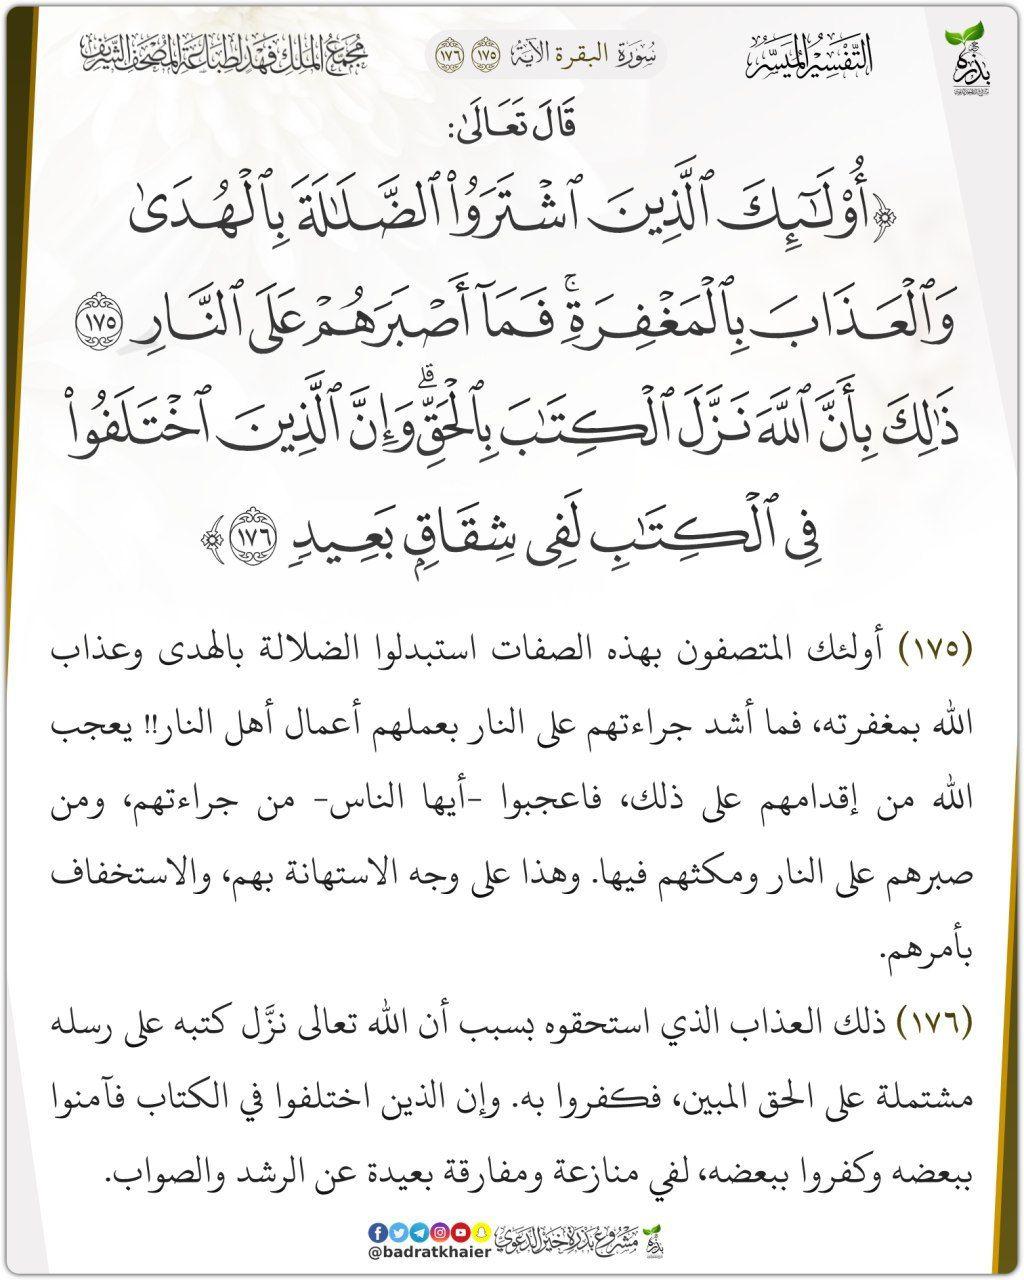 البقرة175 176 Math Arabic Calligraphy Calligraphy